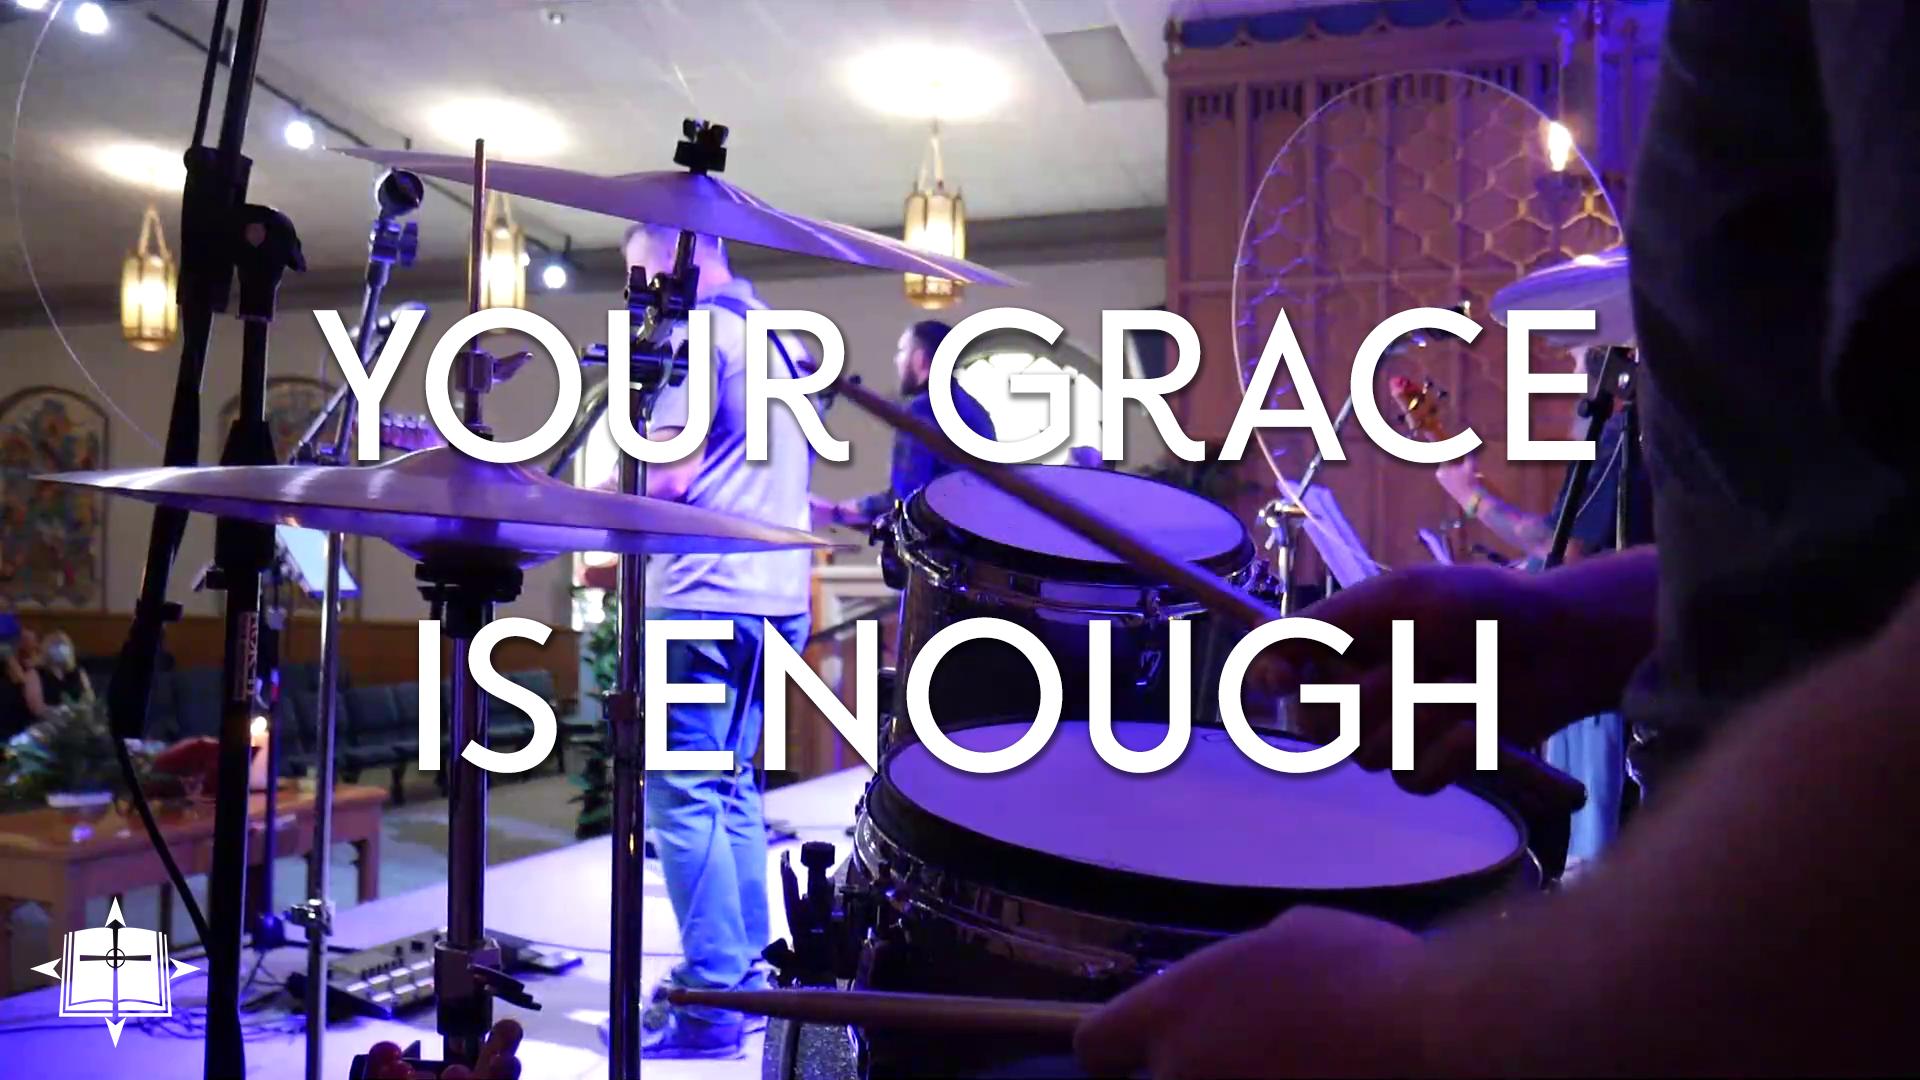 Your Grace Is Enough Image